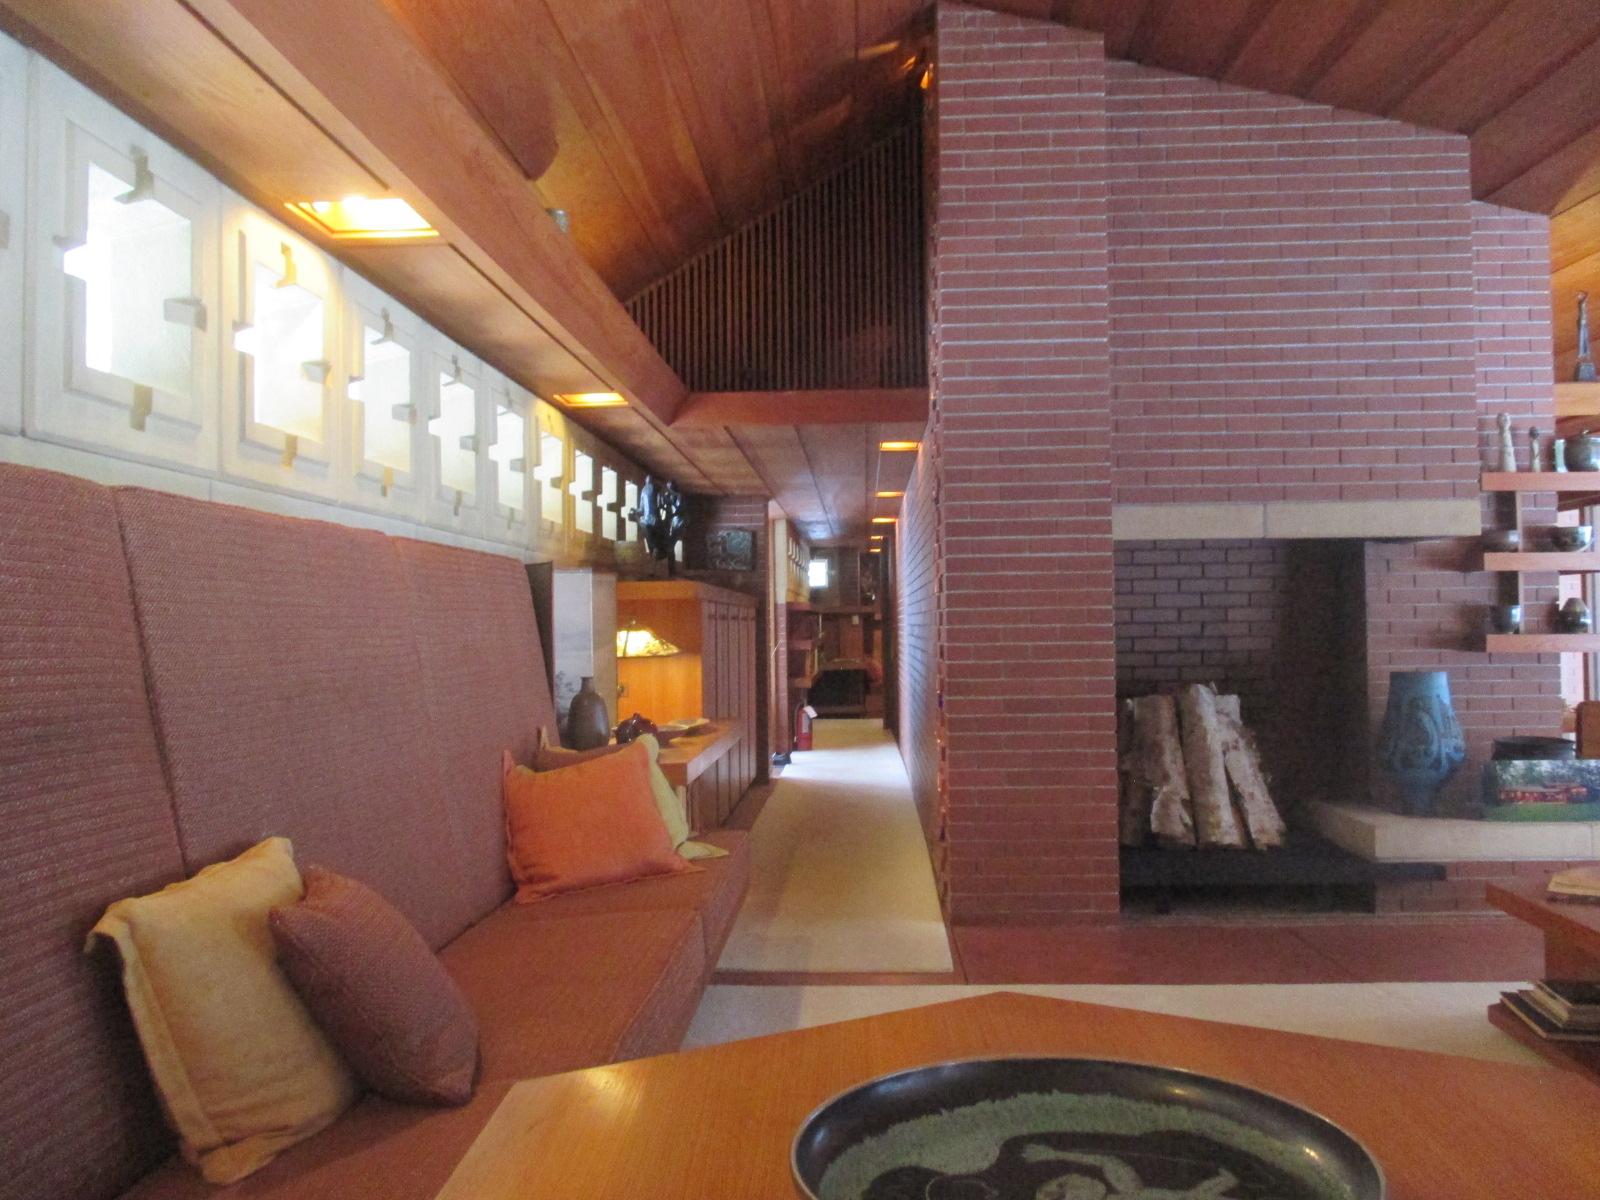 Frank Lloyd Wrights Zimmerman House Manchester NH 121816  52 SundaysHalpern Blog